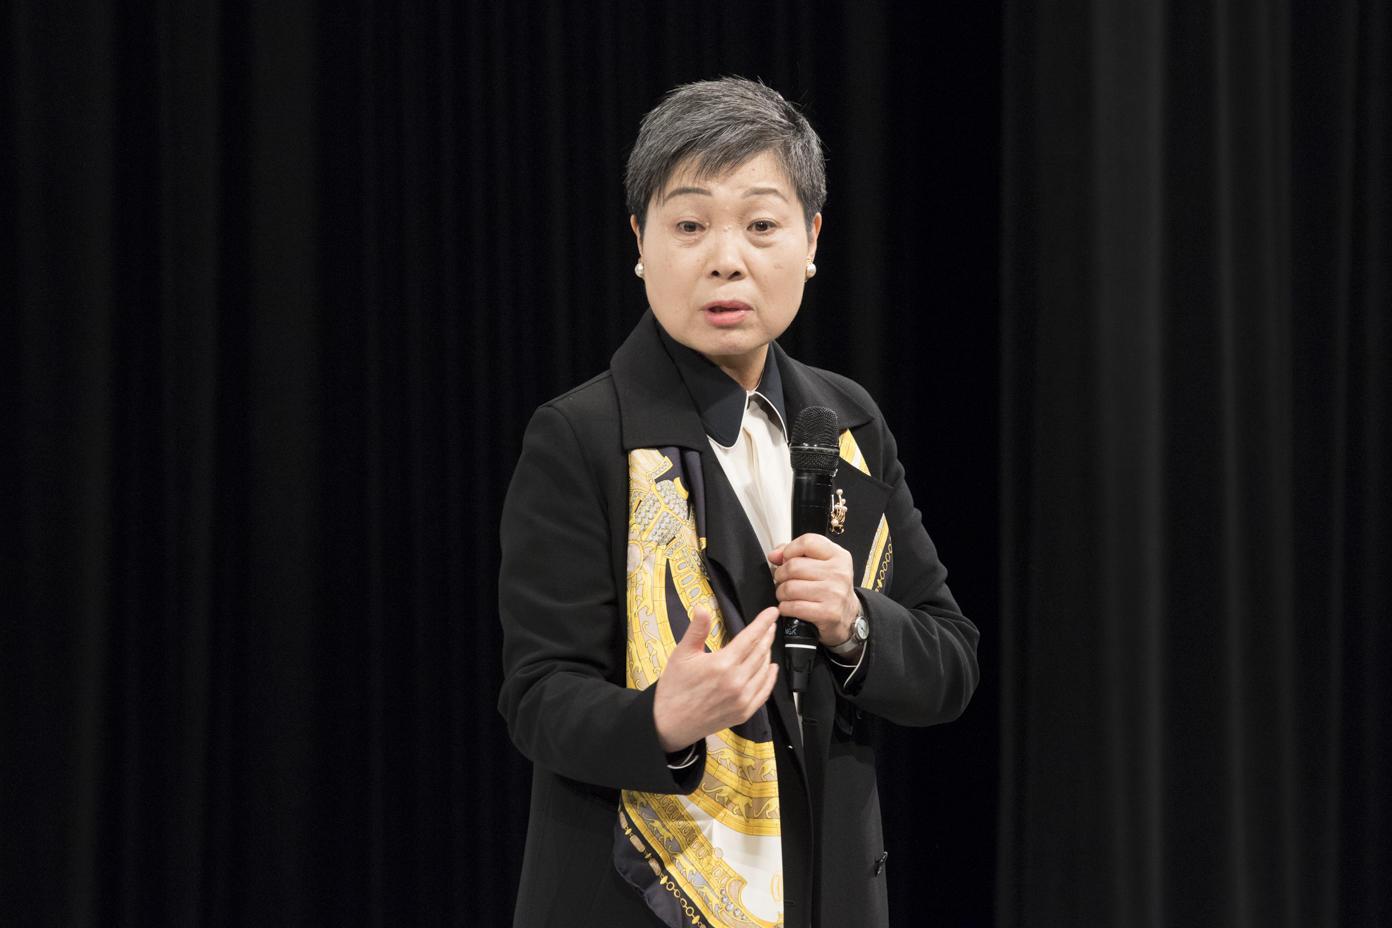 http://news.yoshimoto.co.jp/20170417193454-32a038578467a0dea235466f4cfb2bfd2411528e.jpg